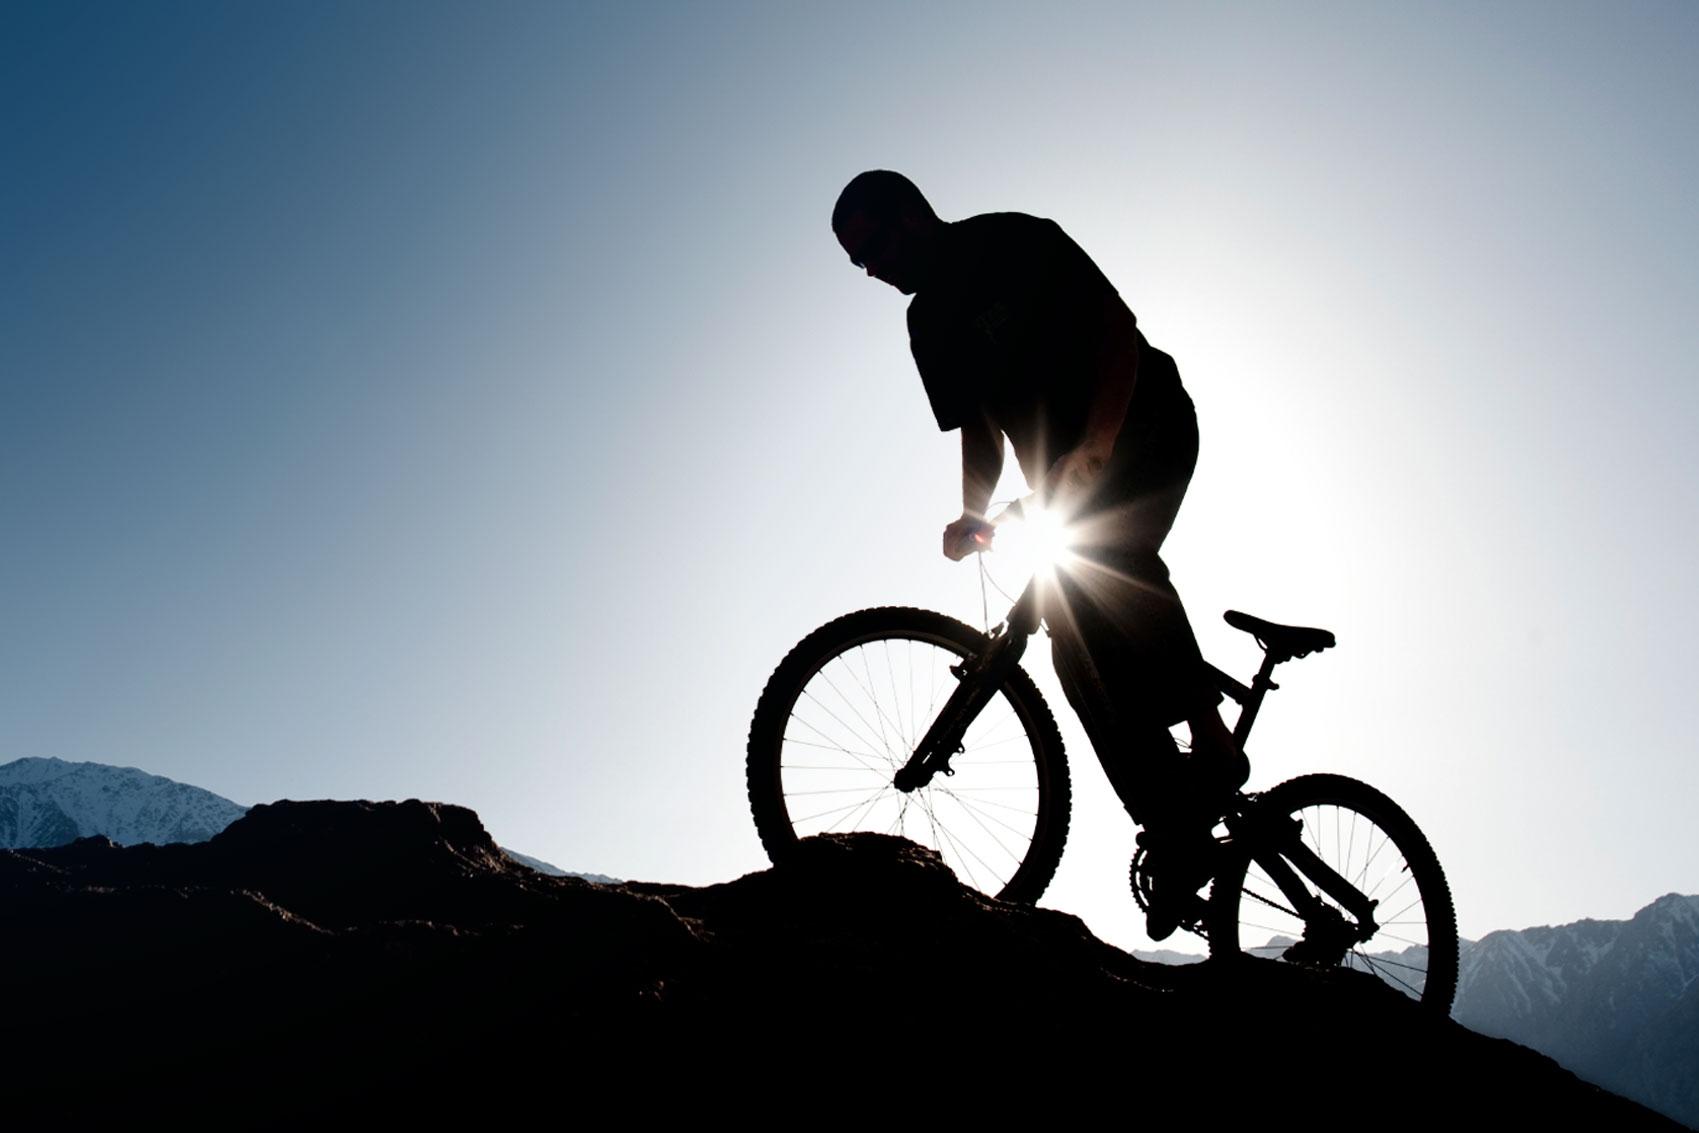 Sauser en Kulhavy winnen eerste rit in Cape Epic